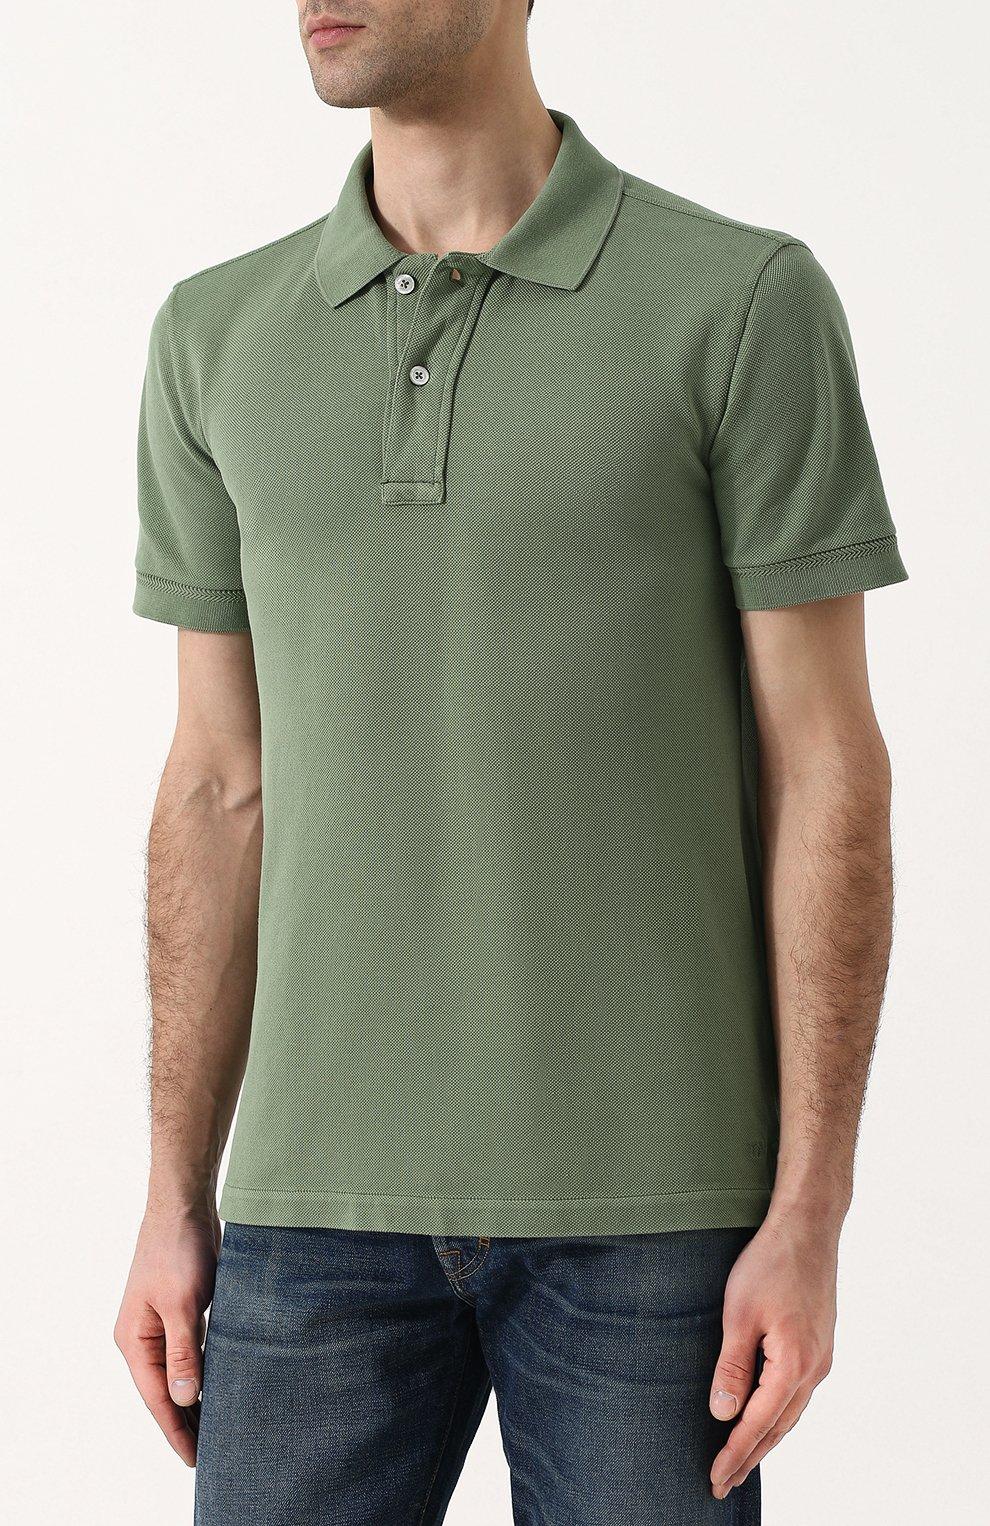 Мужское хлопковое поло с короткими рукавами TOM FORD зеленого цвета, арт. BP331/TFJ664 | Фото 3